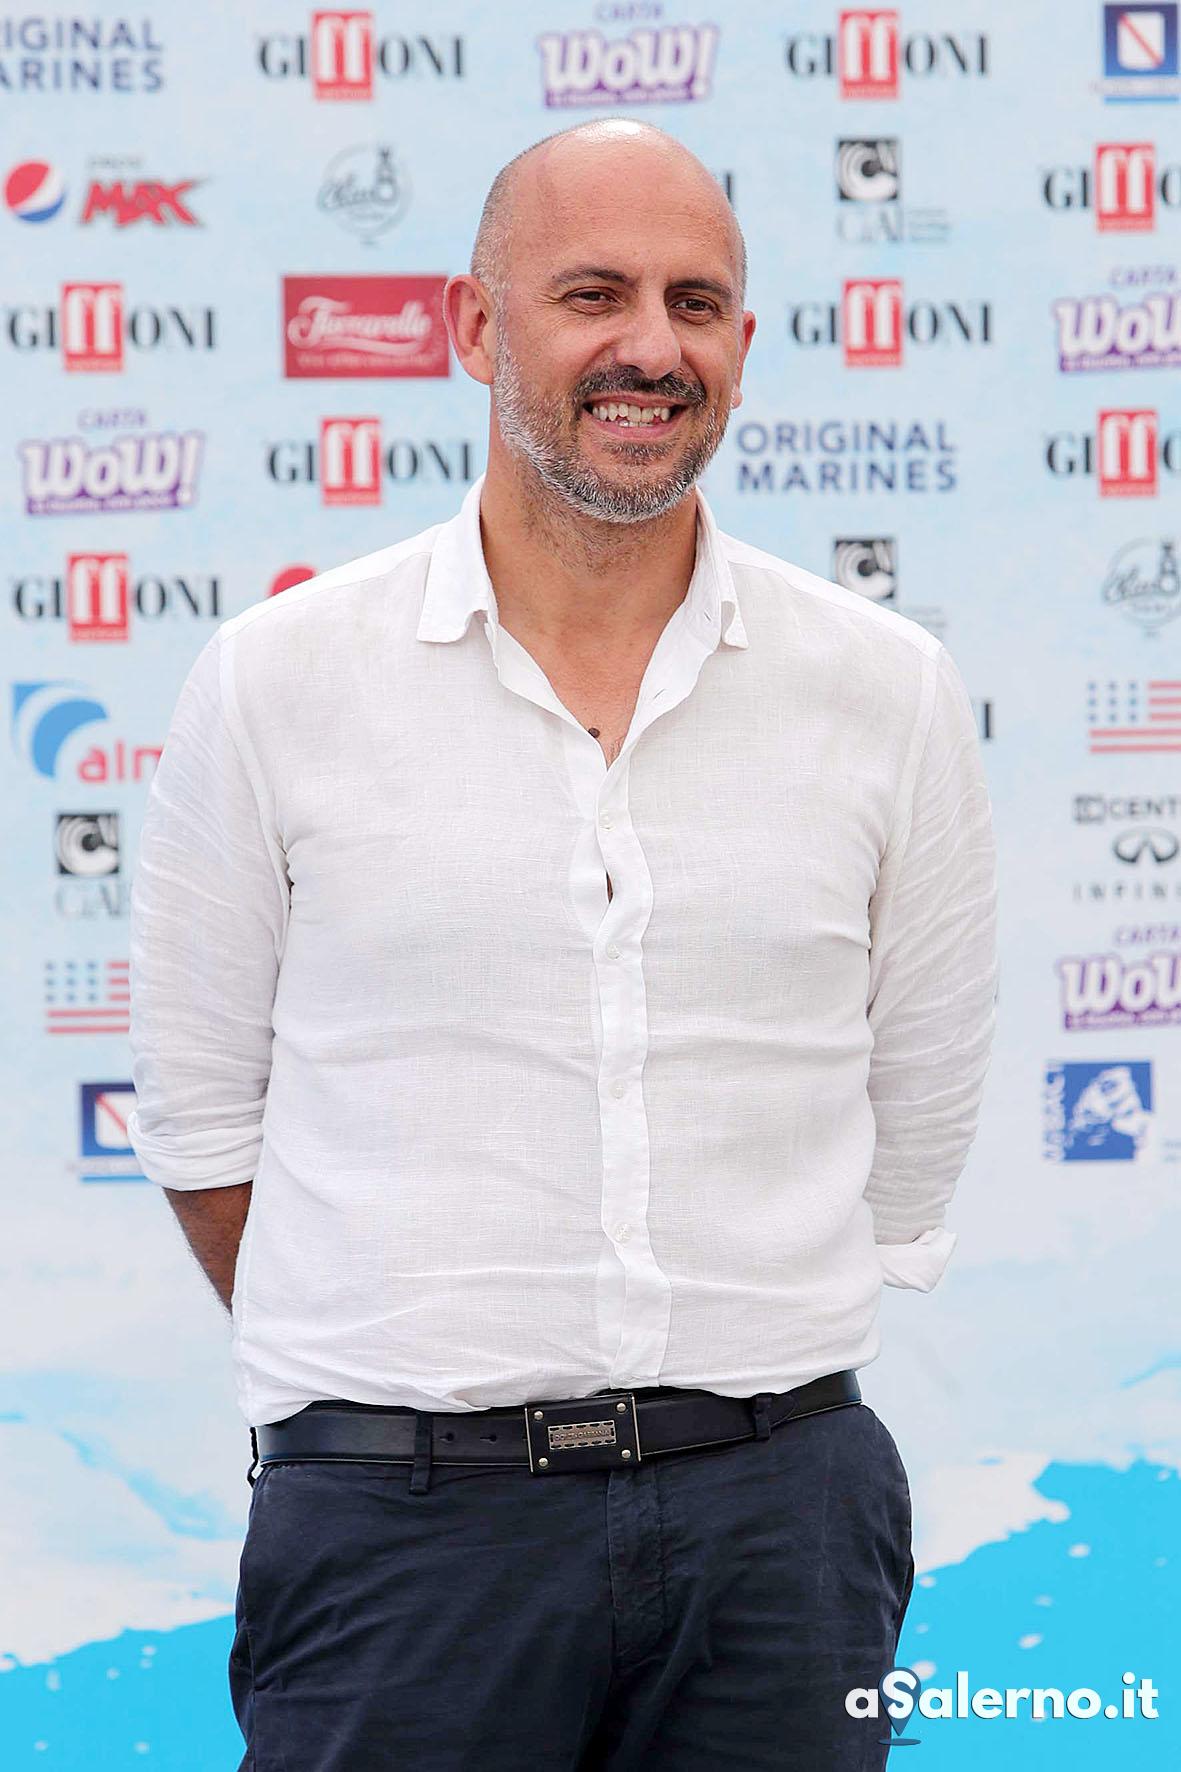 SAL - 23 07 2018 Giffoni Film Festival. Nella foto Marco Ponti. Foto Tanopress